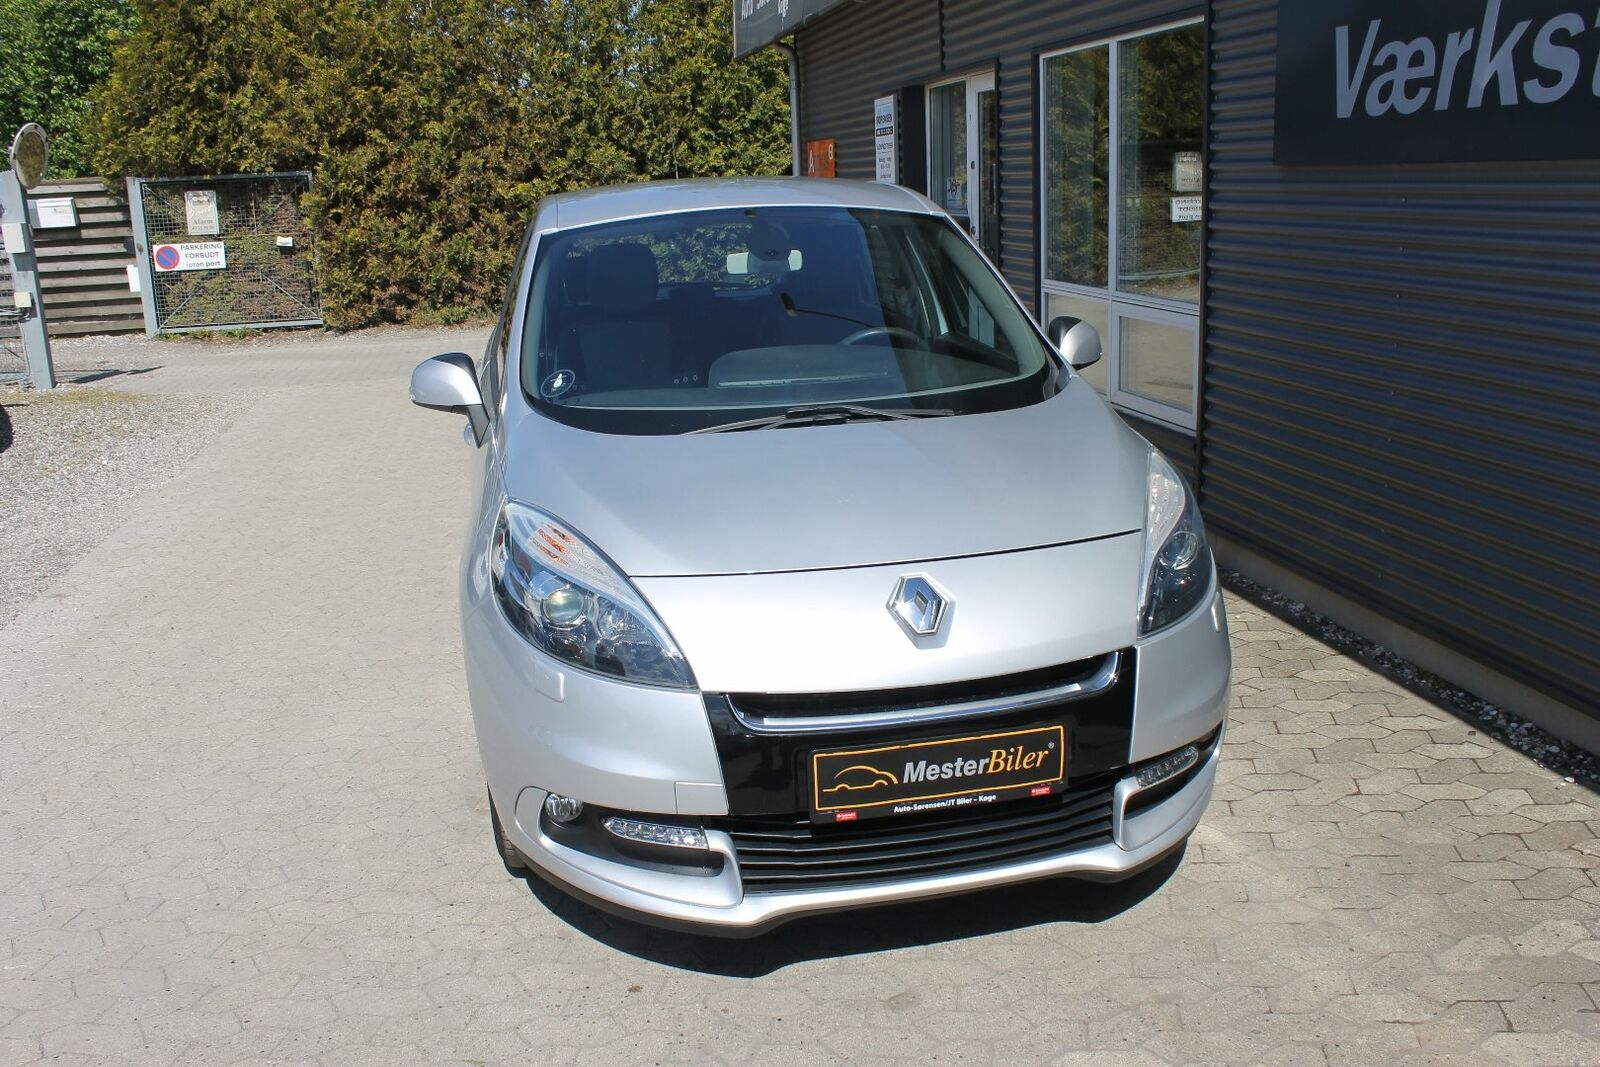 Renault Scenic III 1,5 dCi 95 Authentique 5d - 89.800 kr.